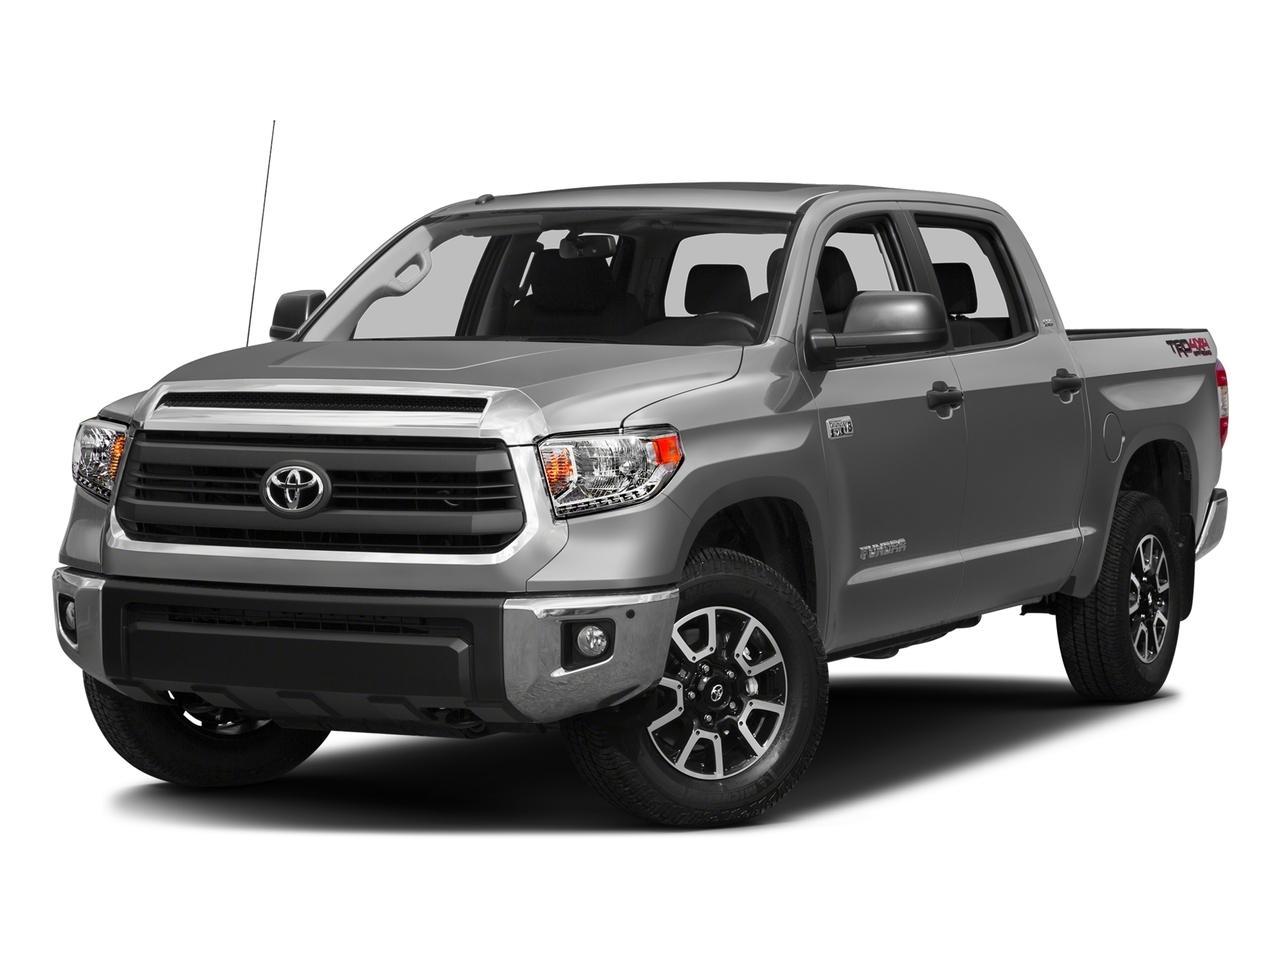 2016 Toyota Tundra 2WD Truck Vehicle Photo in Corpus Christi, TX 78411